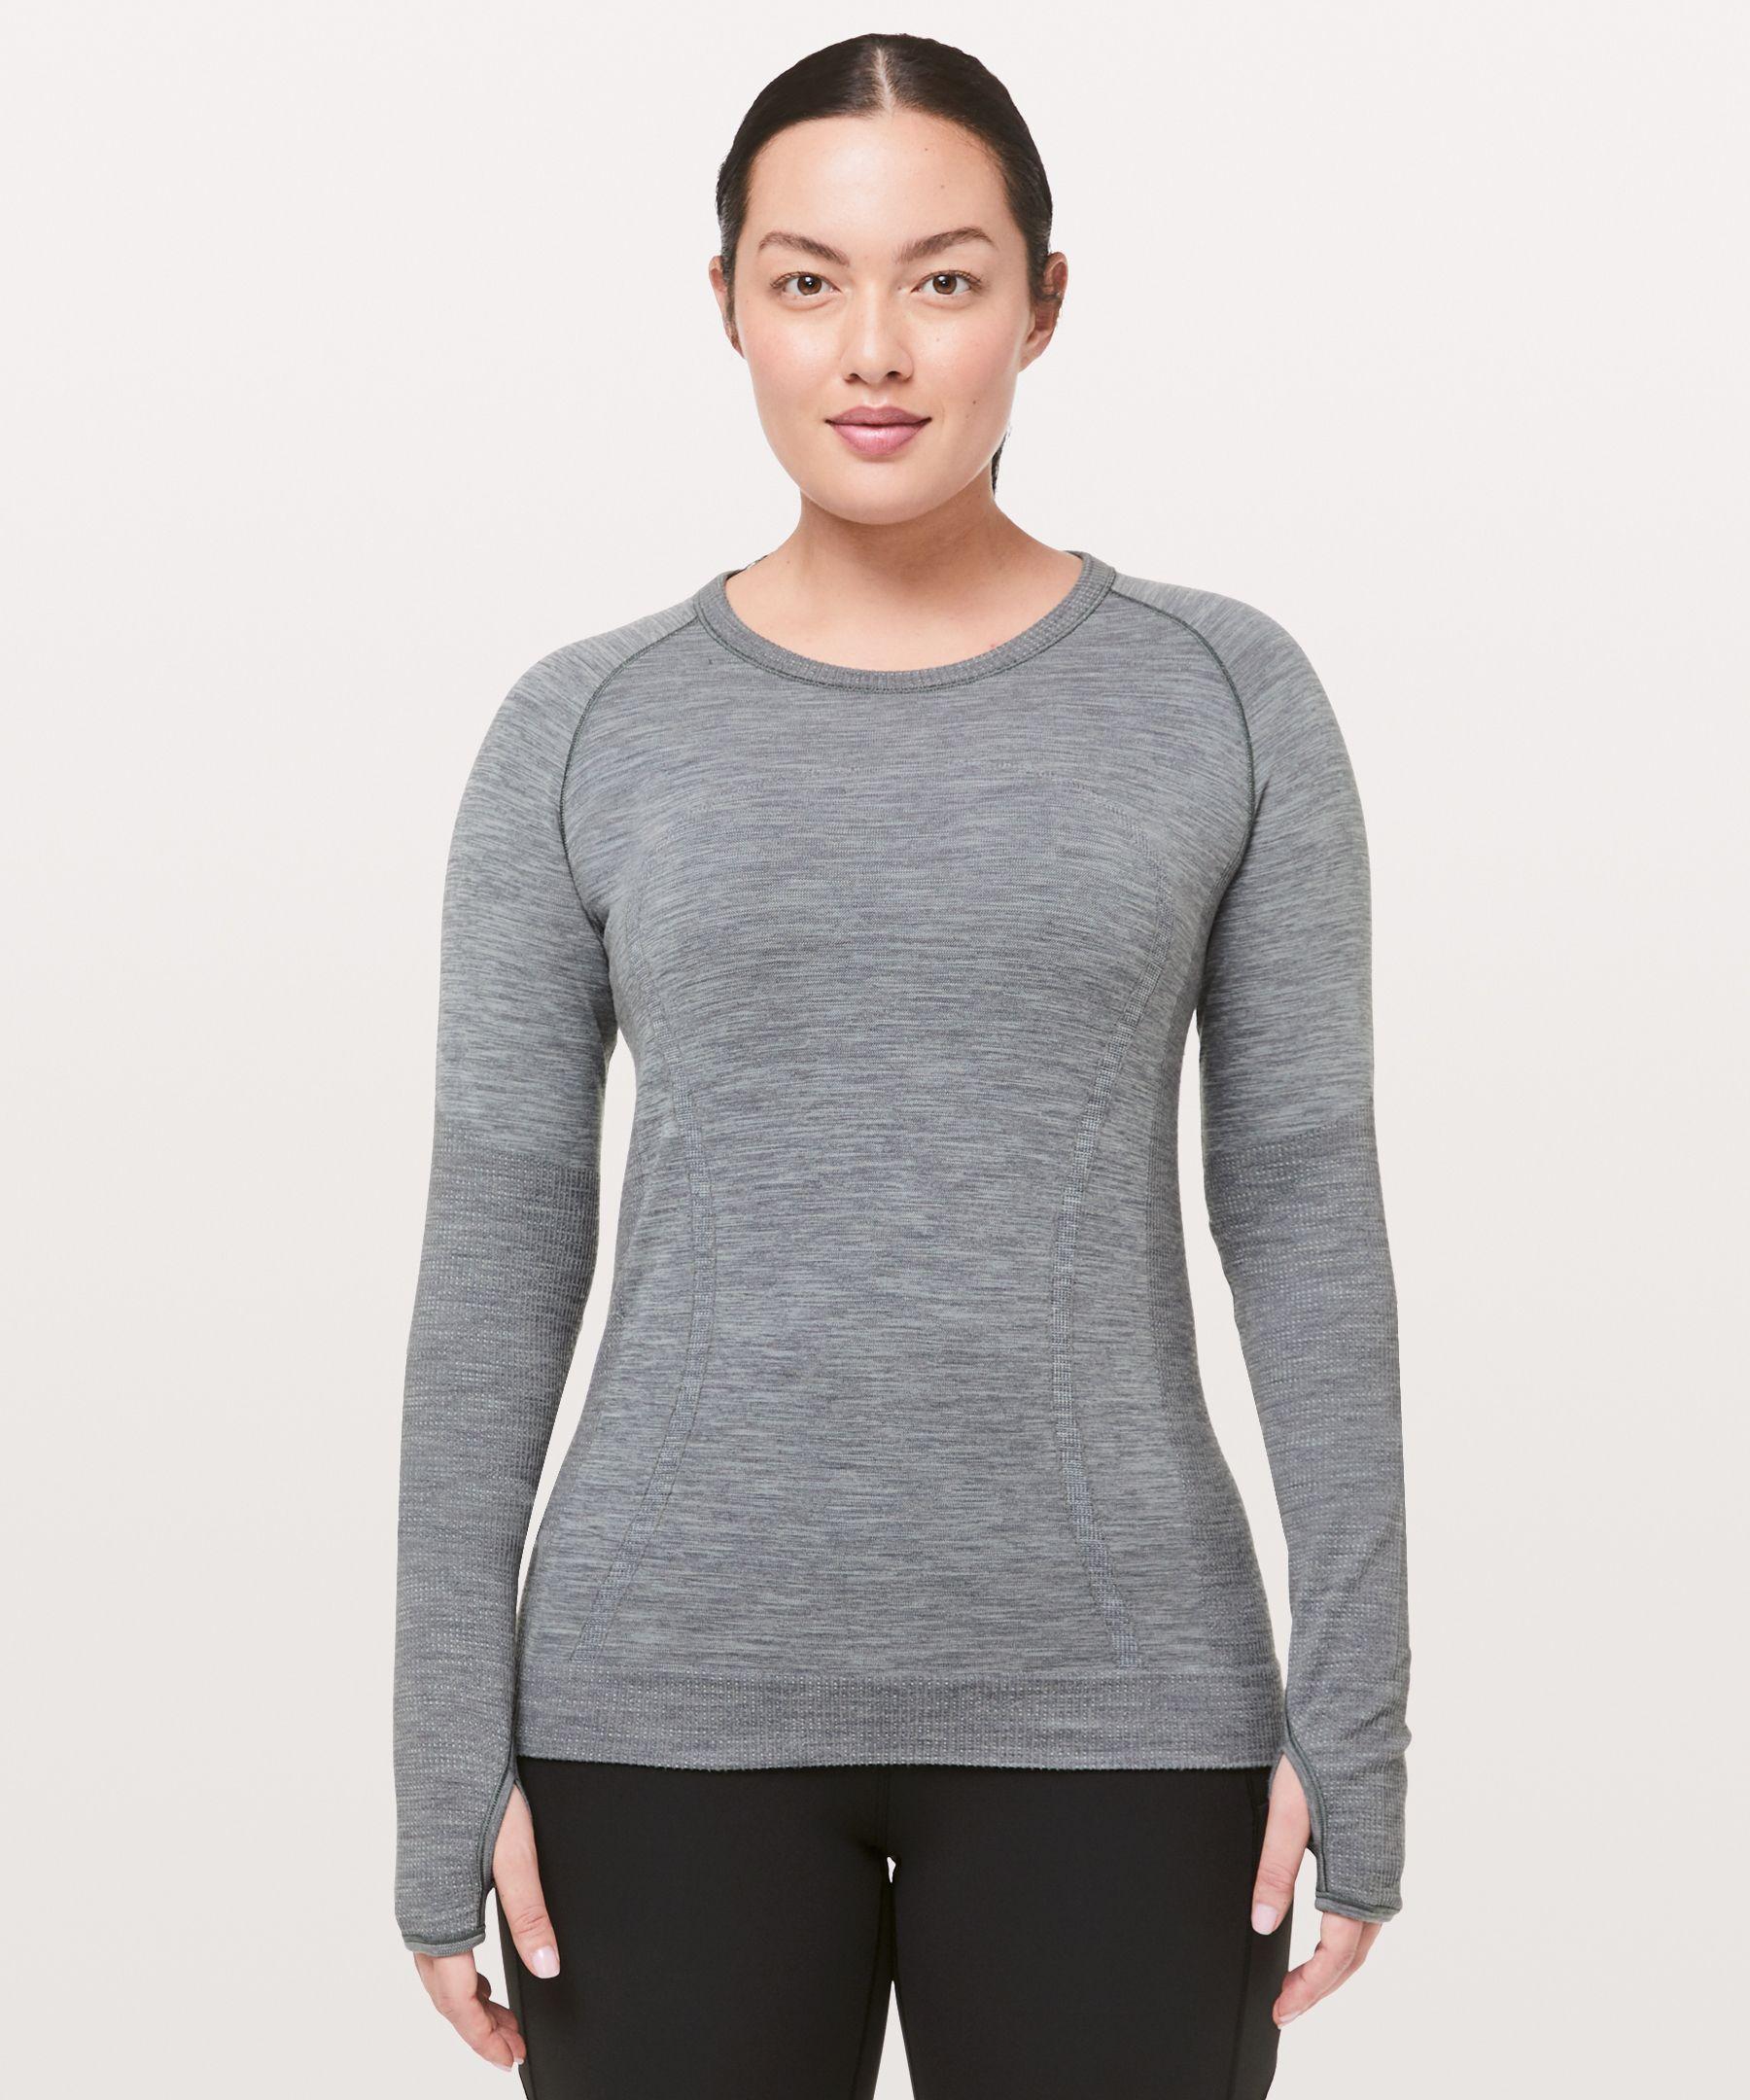 faa0485caeea2 Swiftly Wool Pullover II. Final Sale